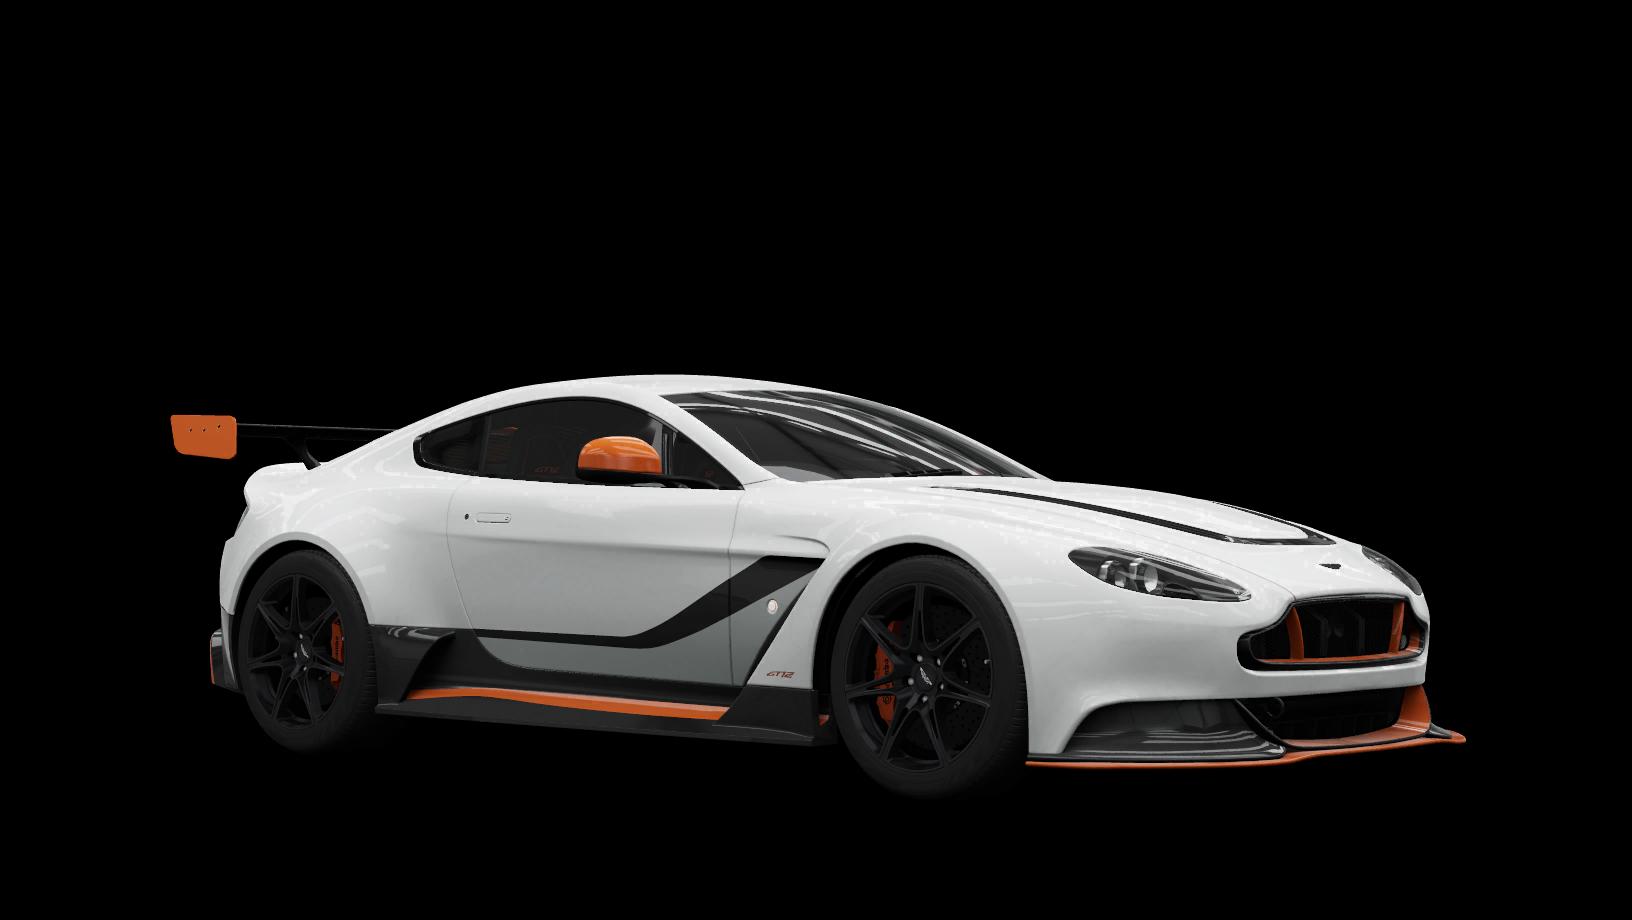 Aston Martin Vantage Gt12 Forza Wiki Fandom